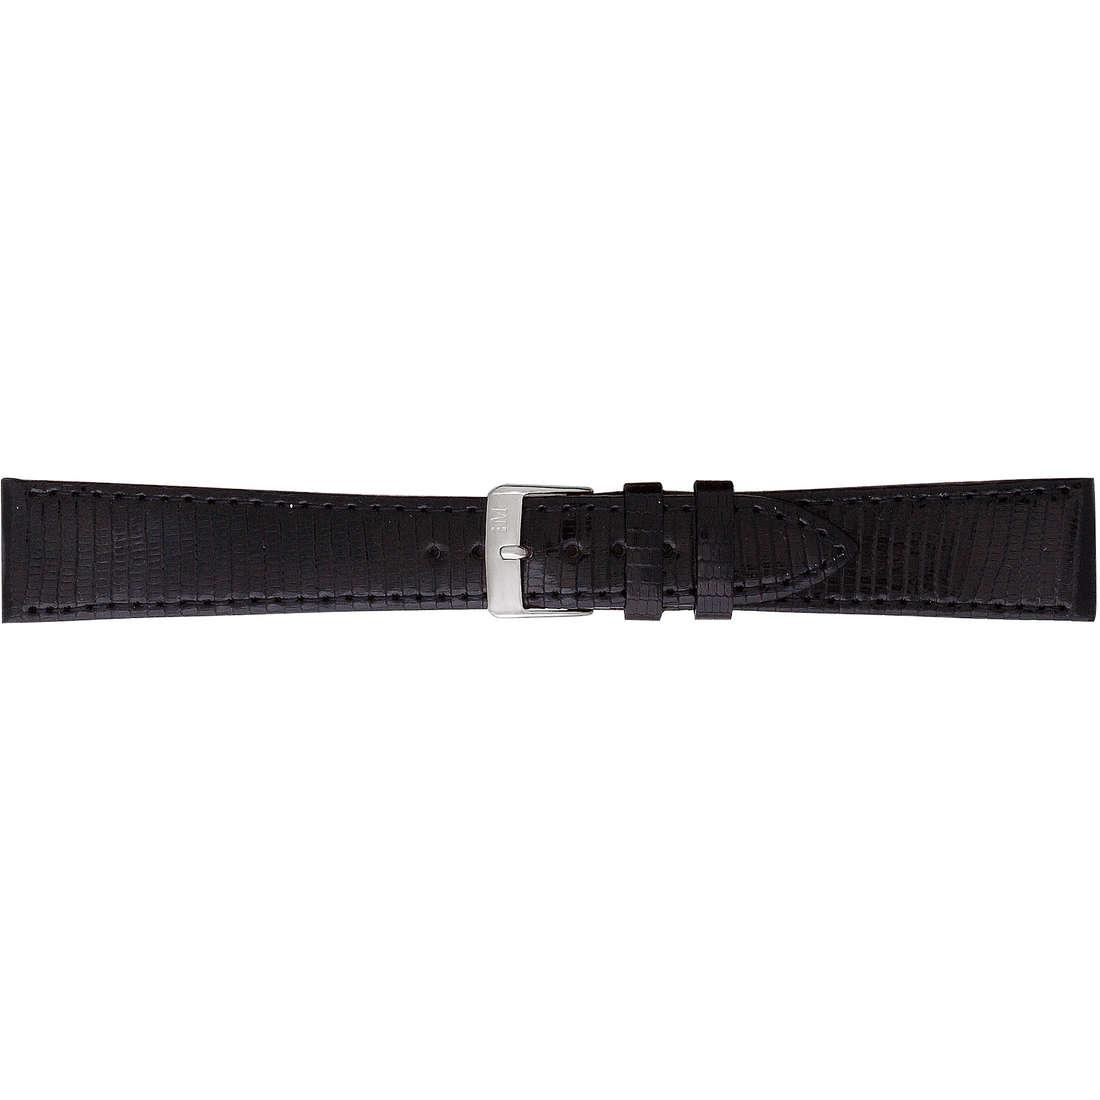 watch watch bands watch straps man Morellato Pelli Preziose A01U0858040019CR18